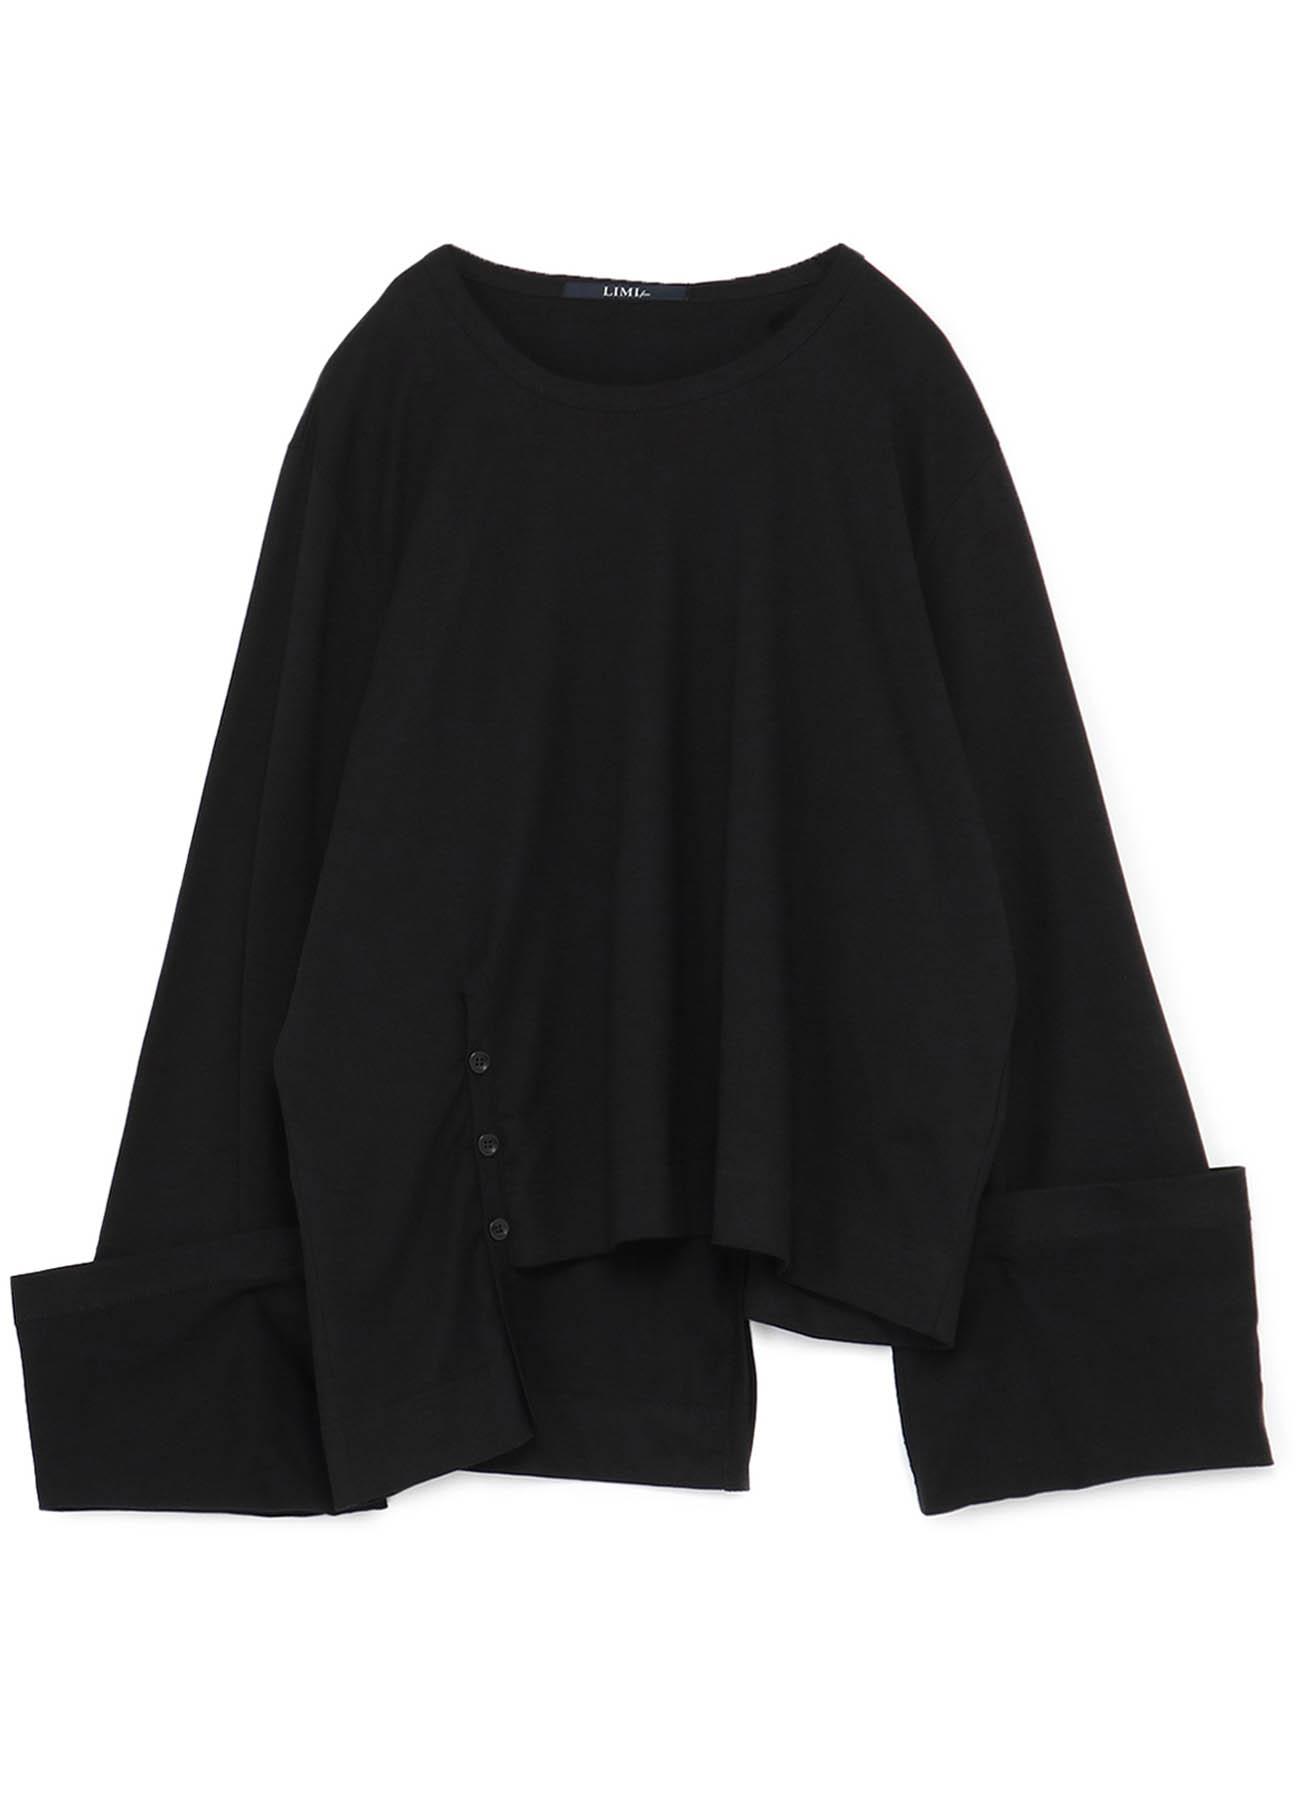 40/2 Cotton Plain stitch Slit Binder T-shirt